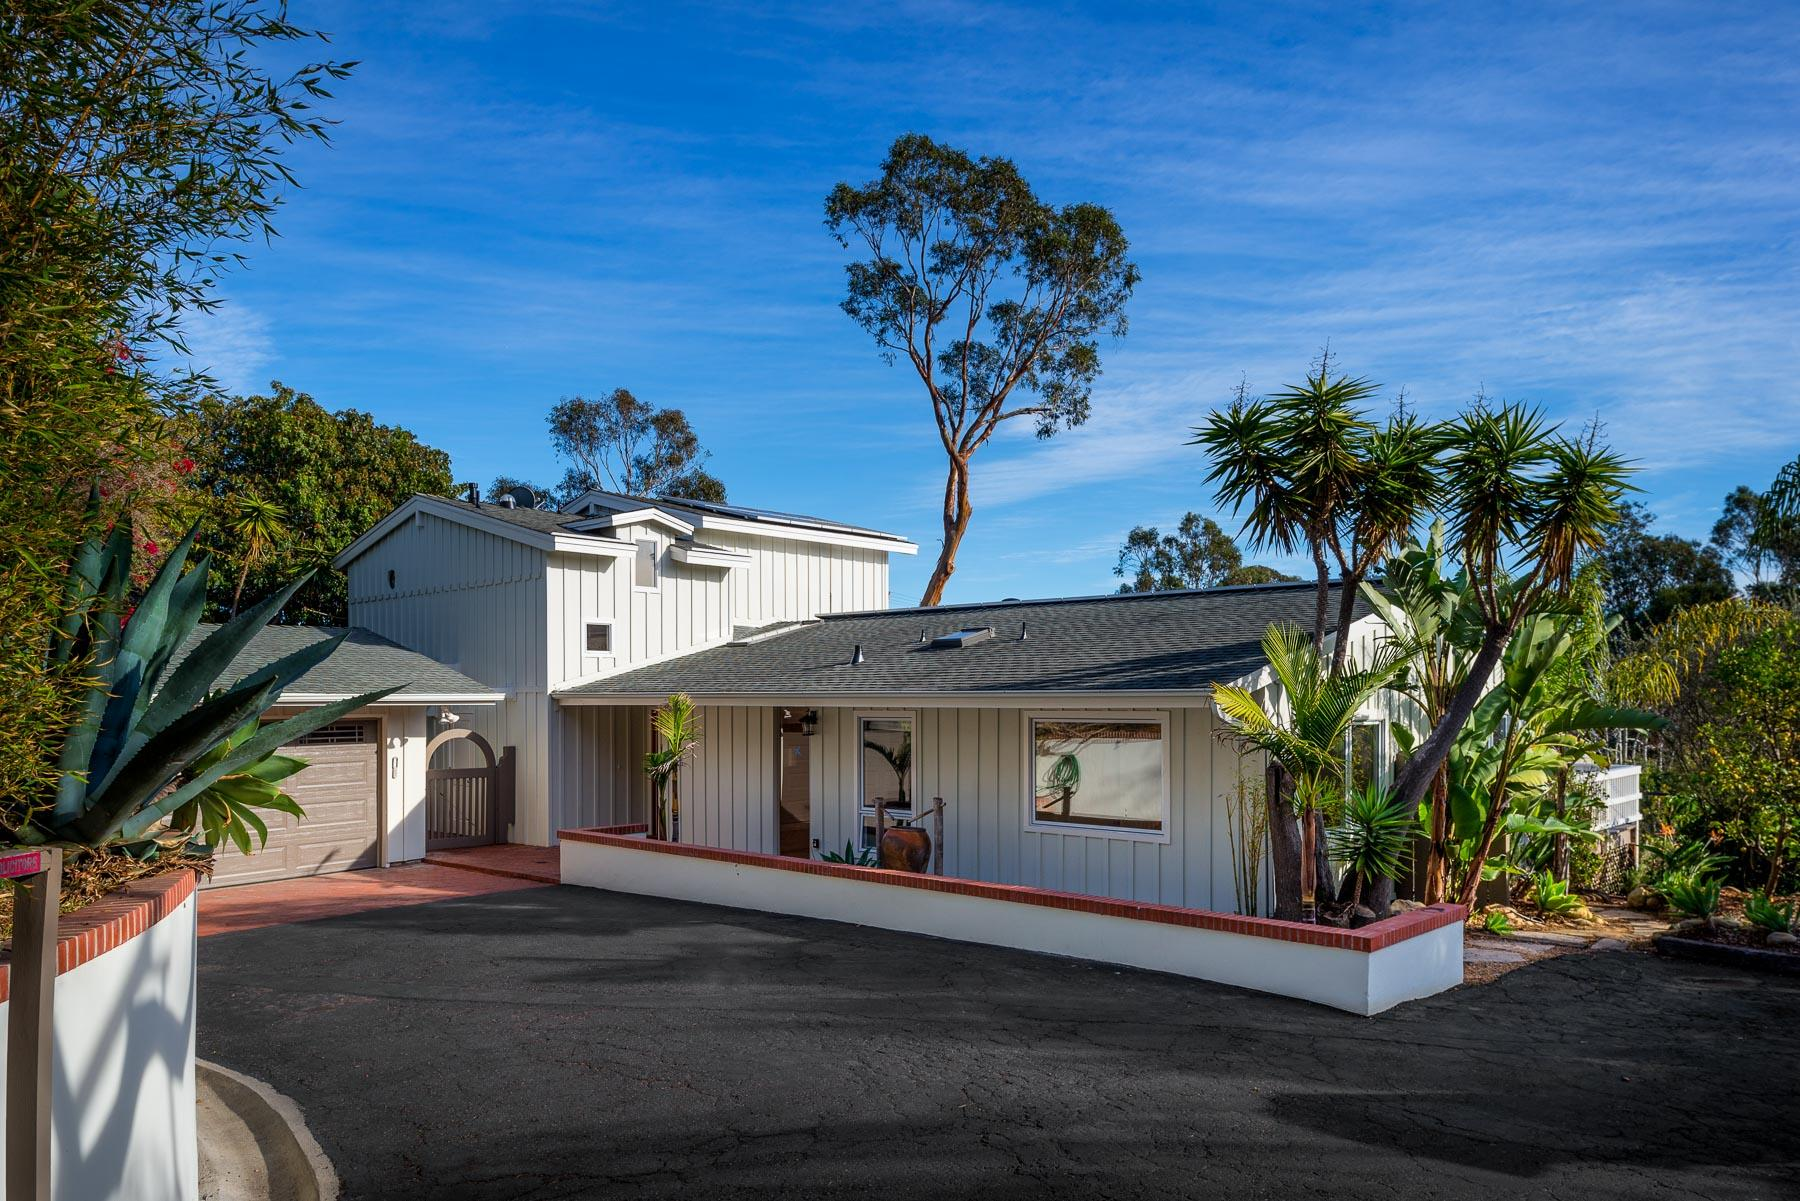 Property photo for 921 Isleta Ave Santa Barbara, California 93109 - 16-342